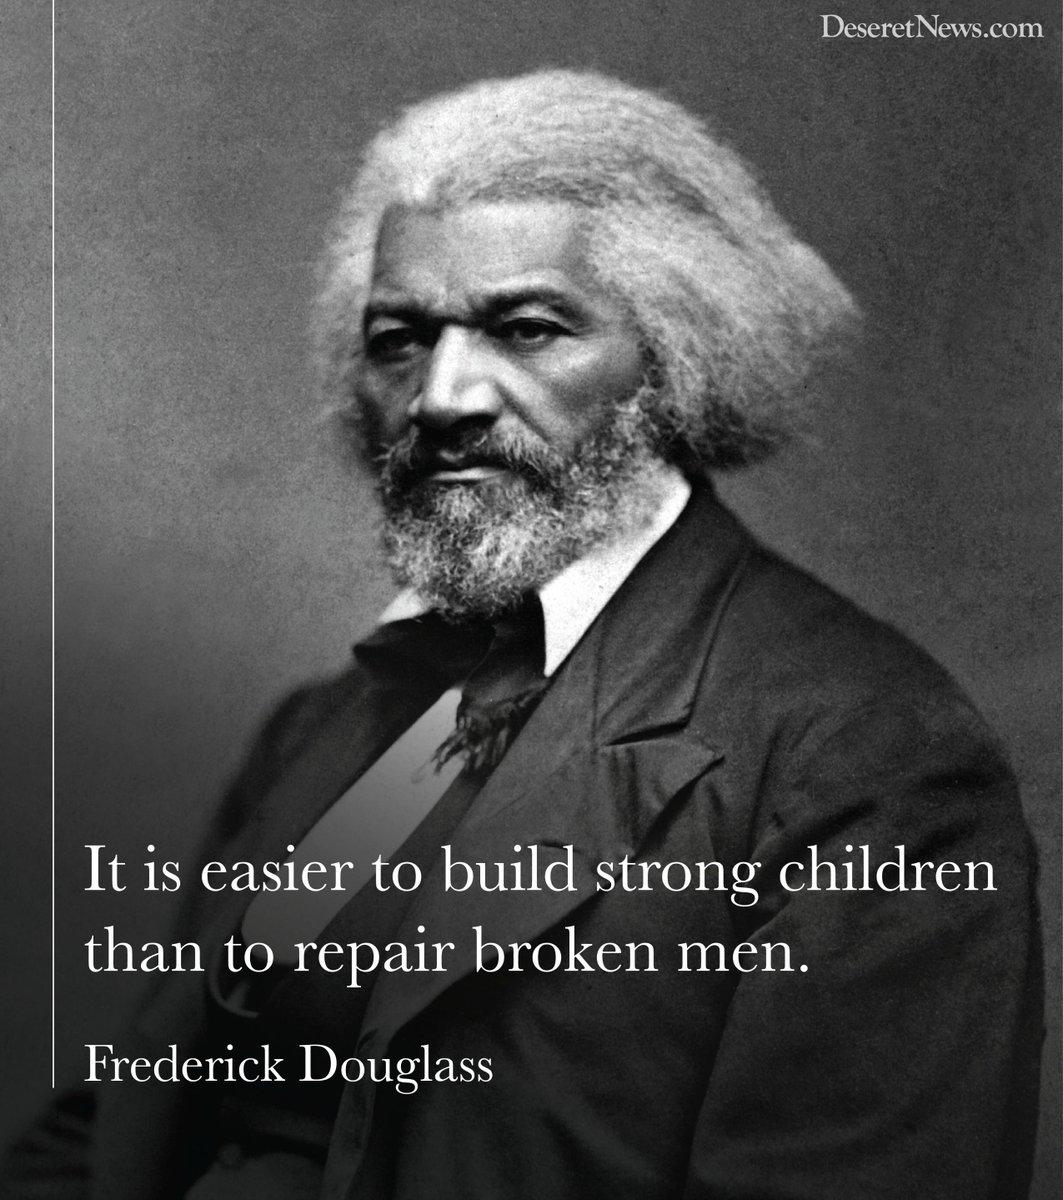 """It is easier to build strong children than to repair broken men."" - Frederick Douglass http://t.co/VFzIGZnF04"